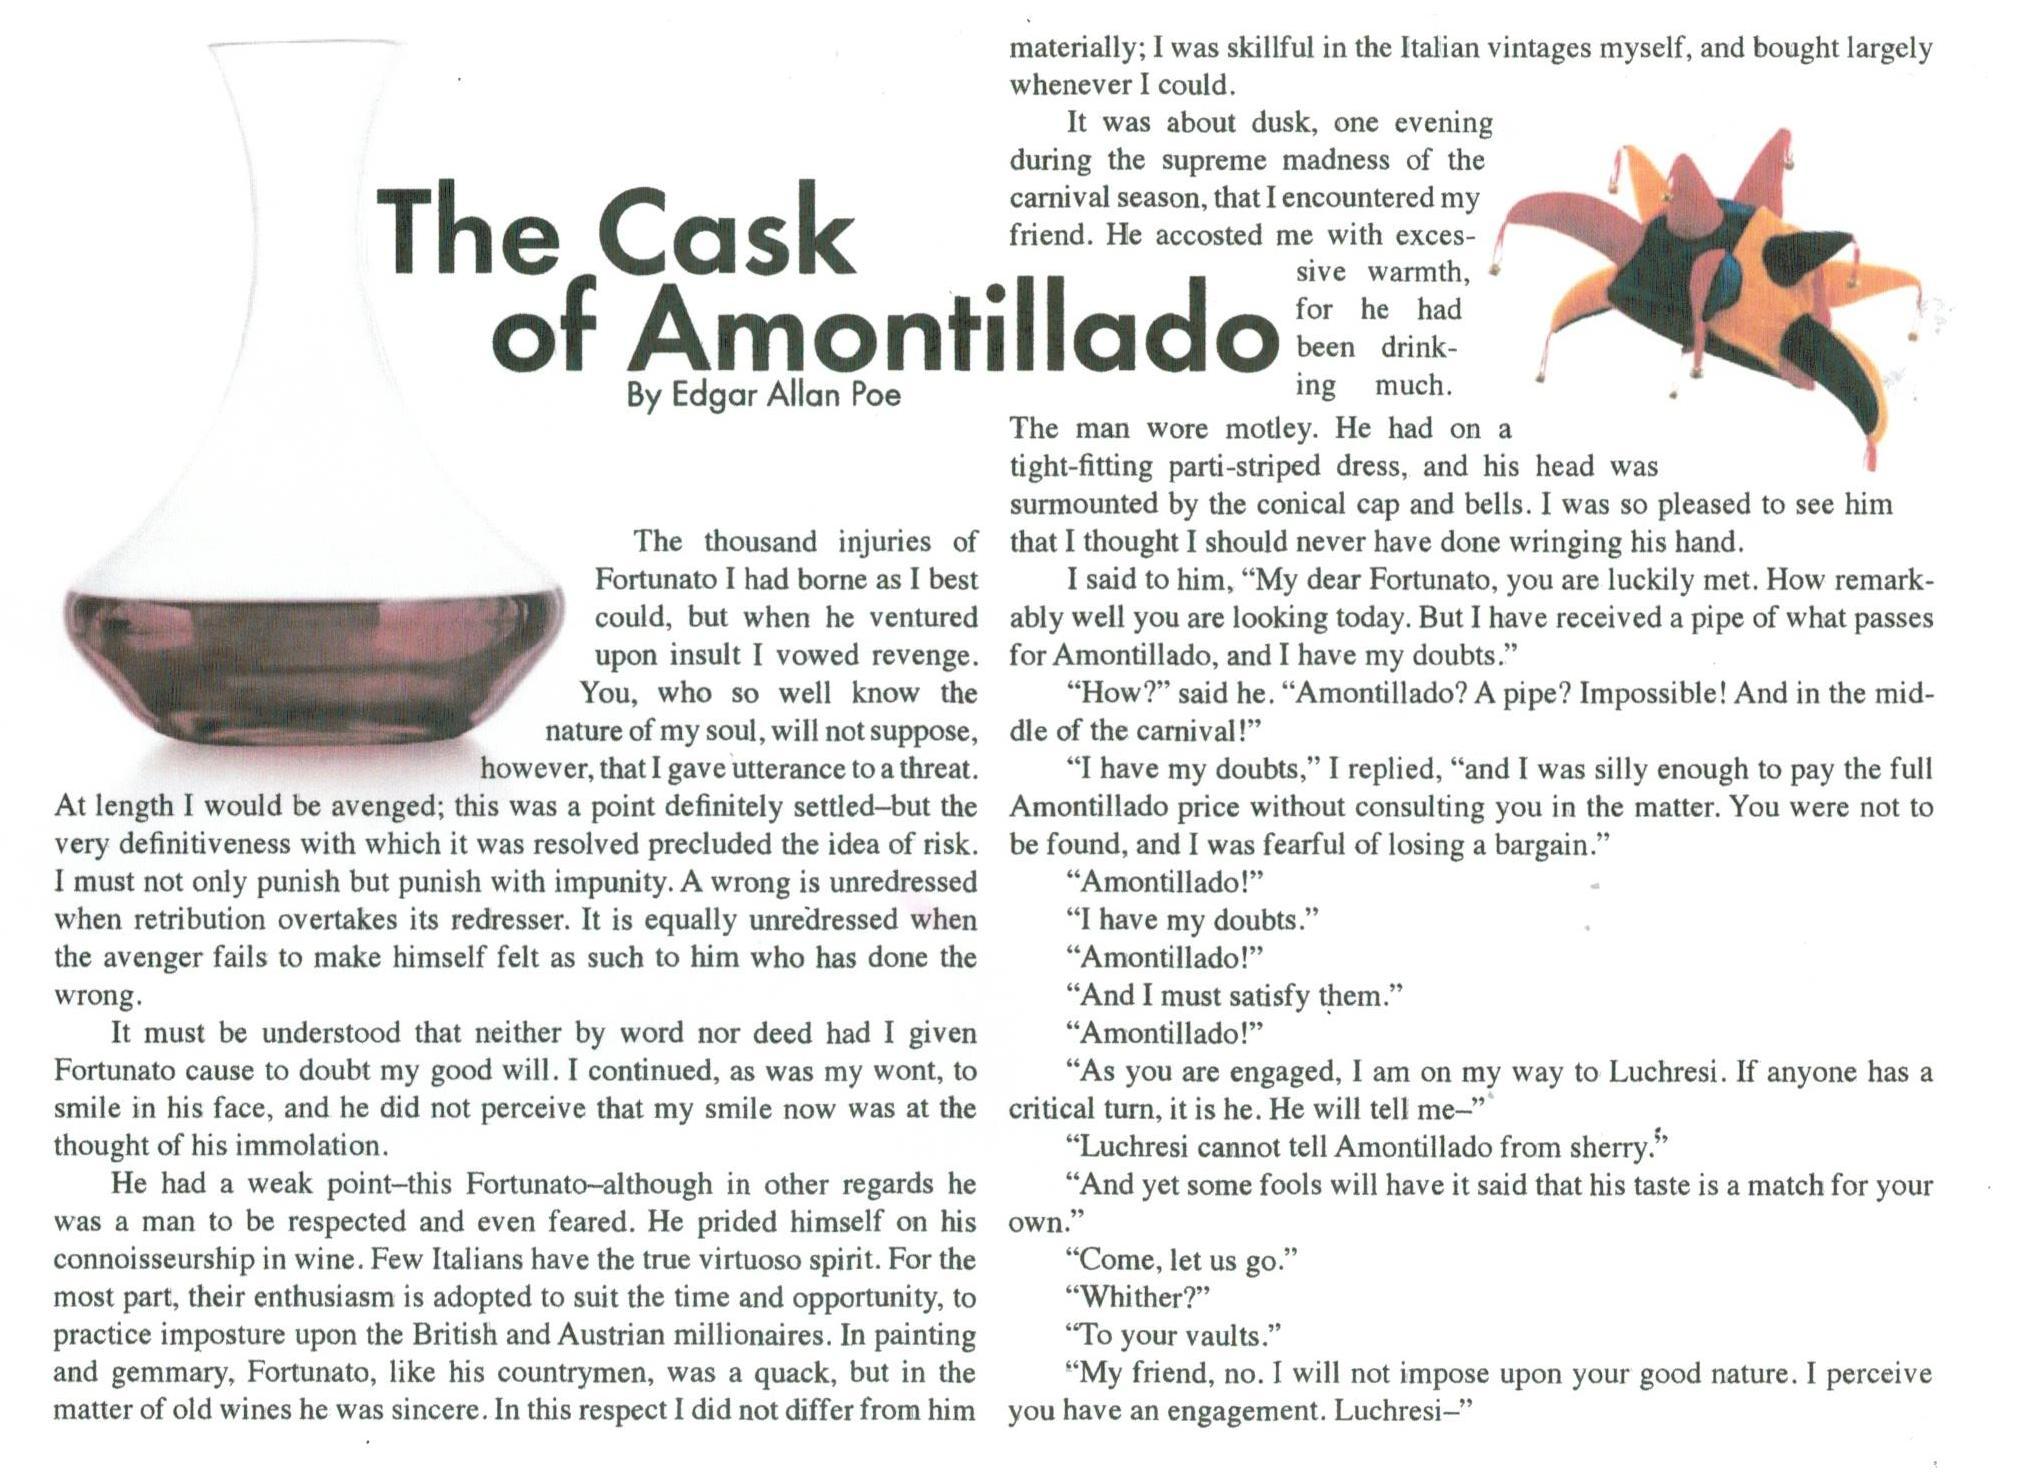 the cask of amontillado story diagram 2006 gmc sierra audio wiring higginbotham michelle edgar allan poe